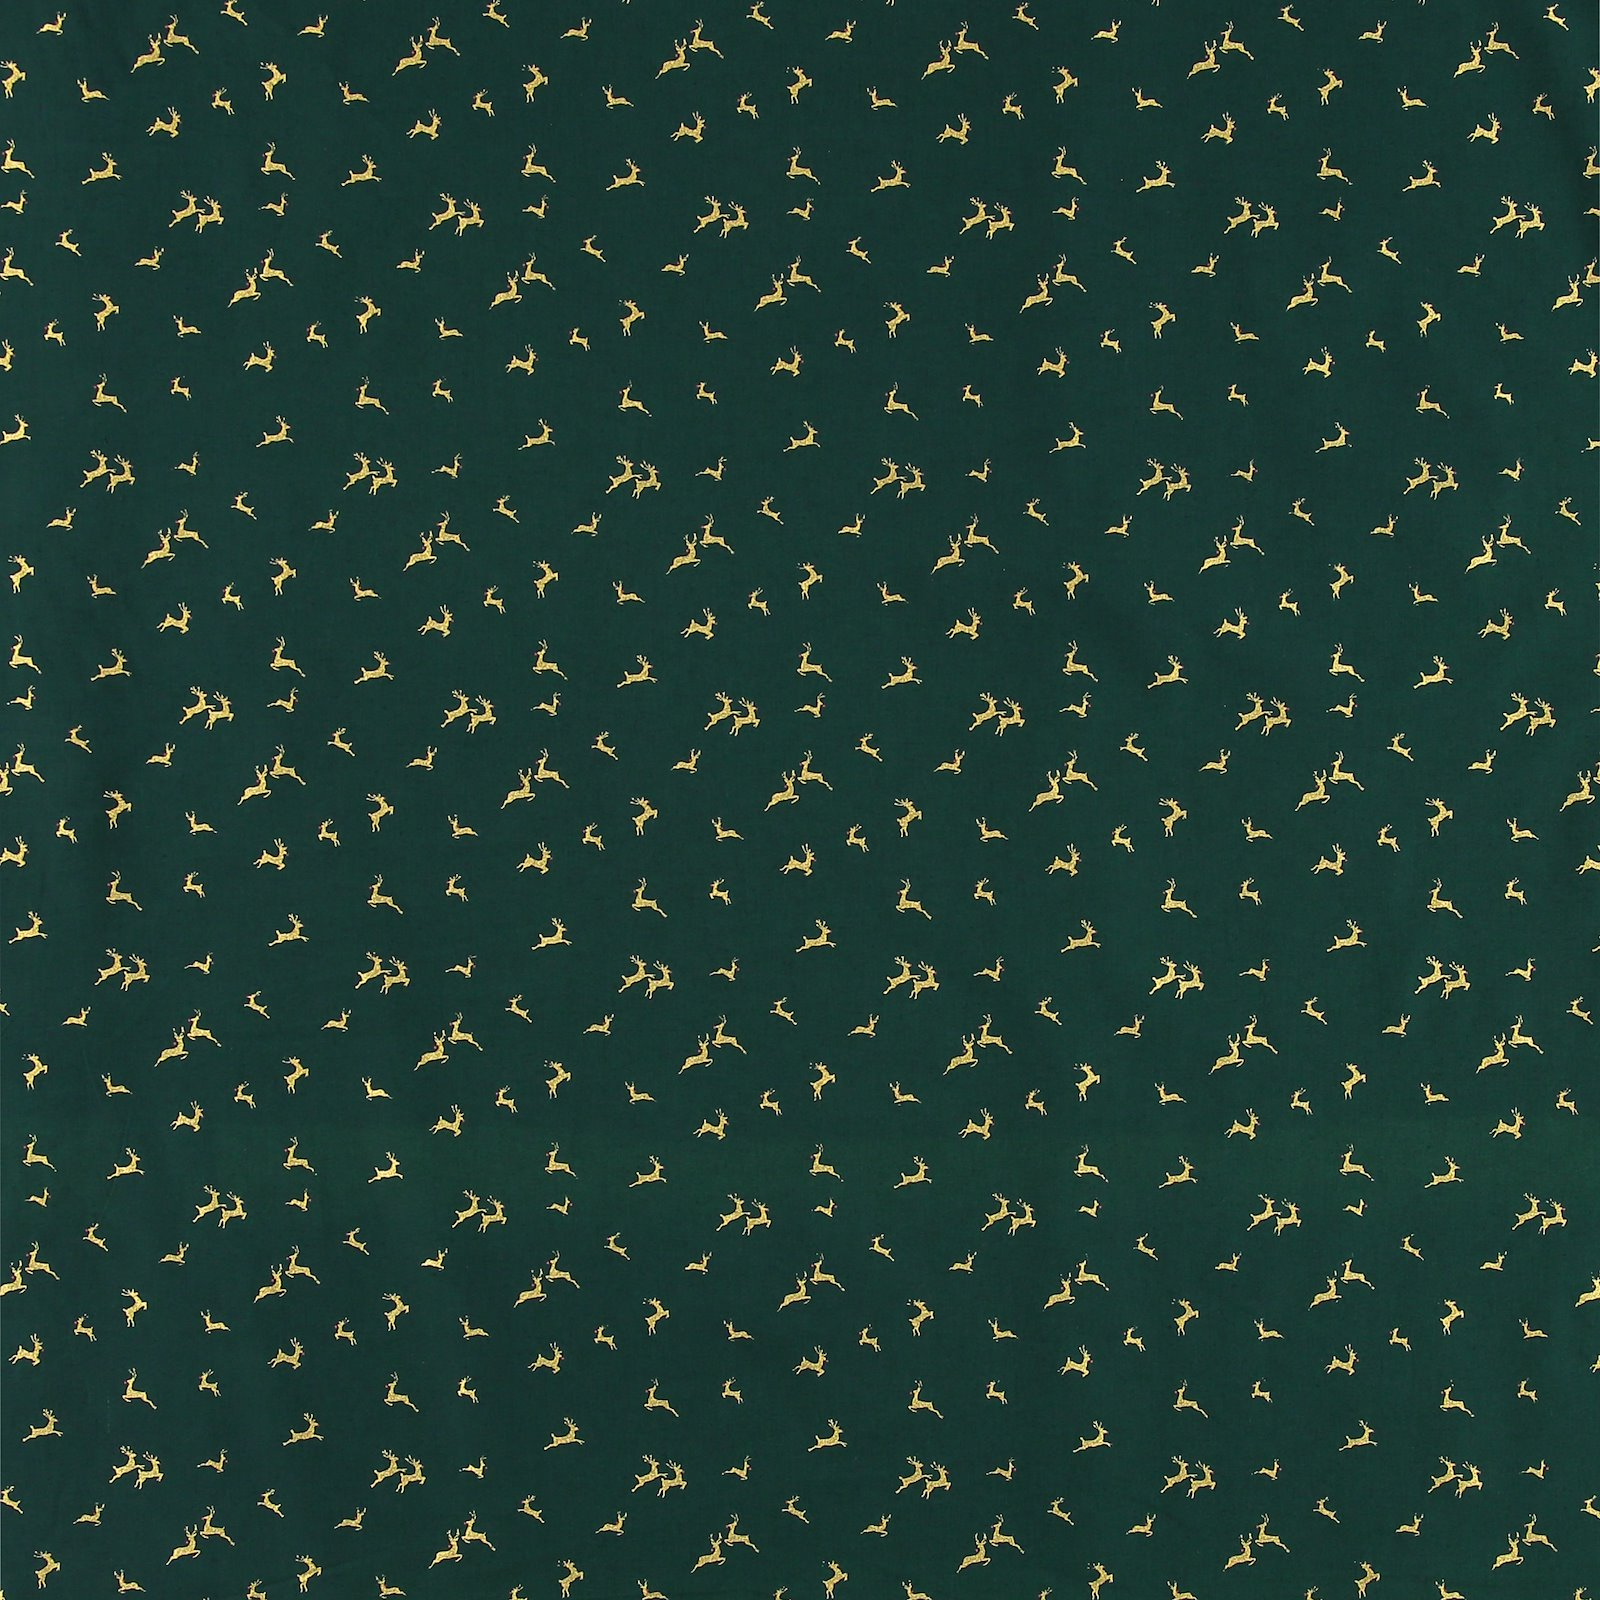 Fat Quarter 45x55cm, Grün mit Rentier 92431_pack_sp